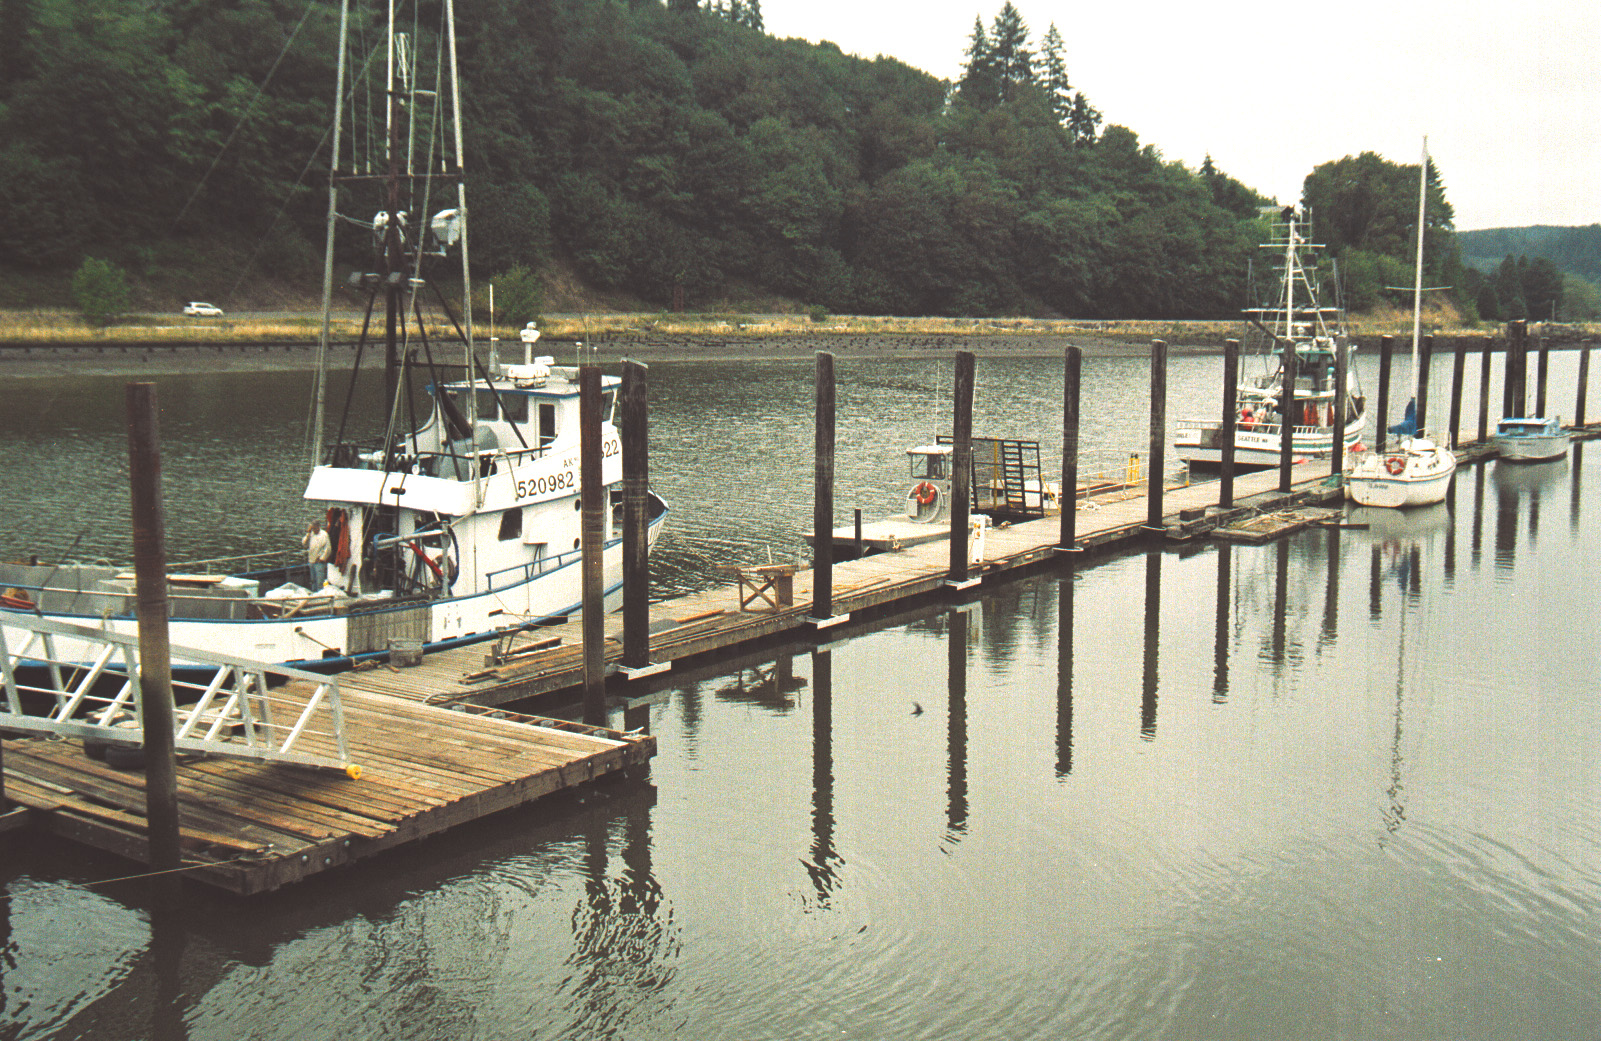 Port of Willapa Harbor